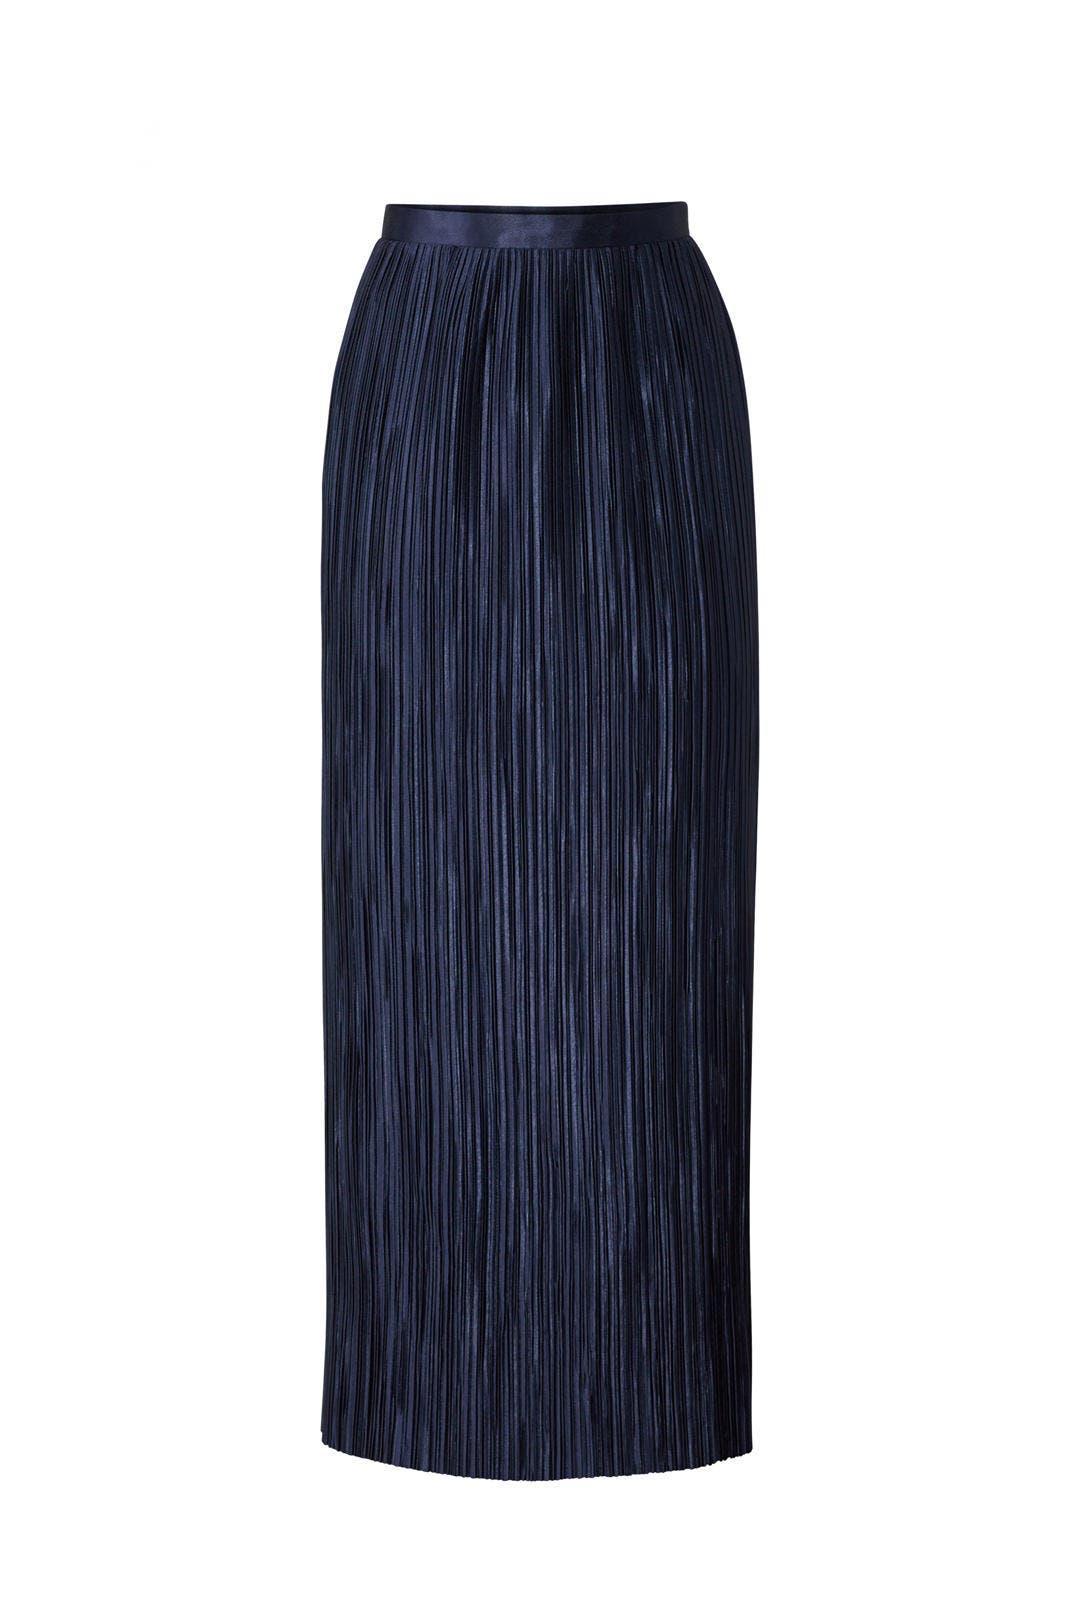 7bdf3d1287 Tibi Denim Midi Skirt – DACC